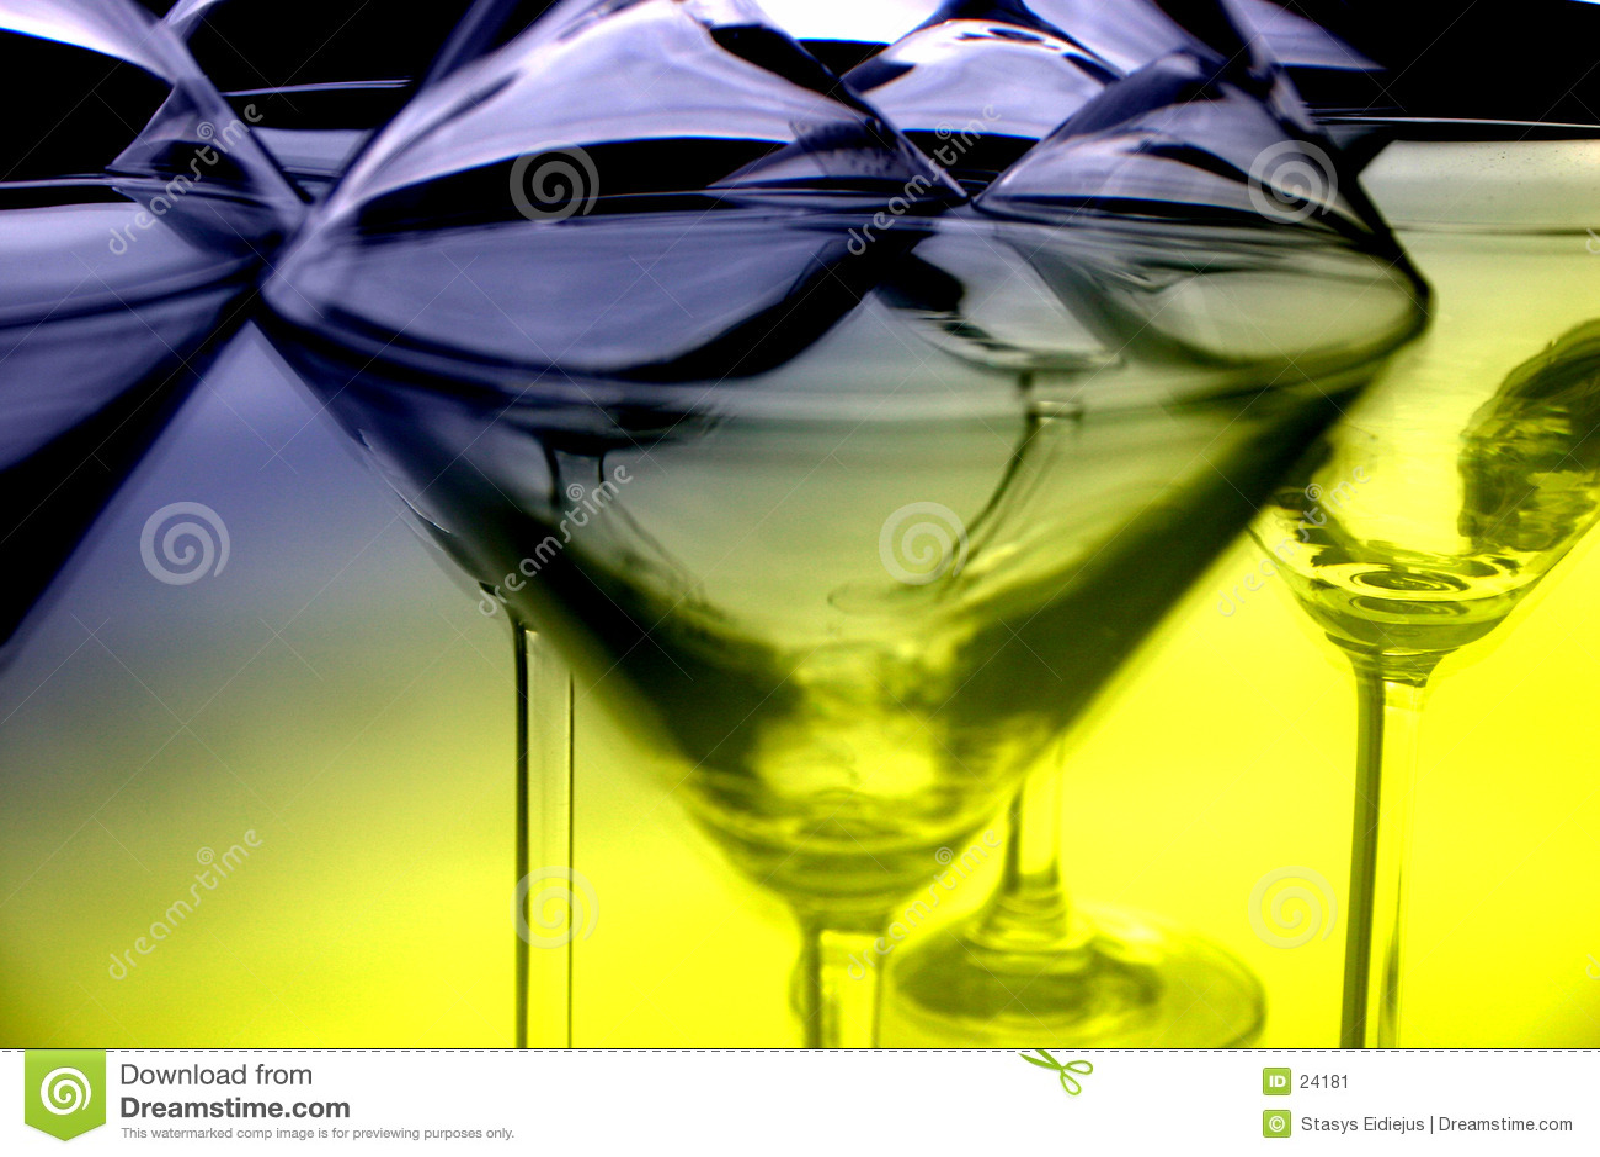 Martini glasses III